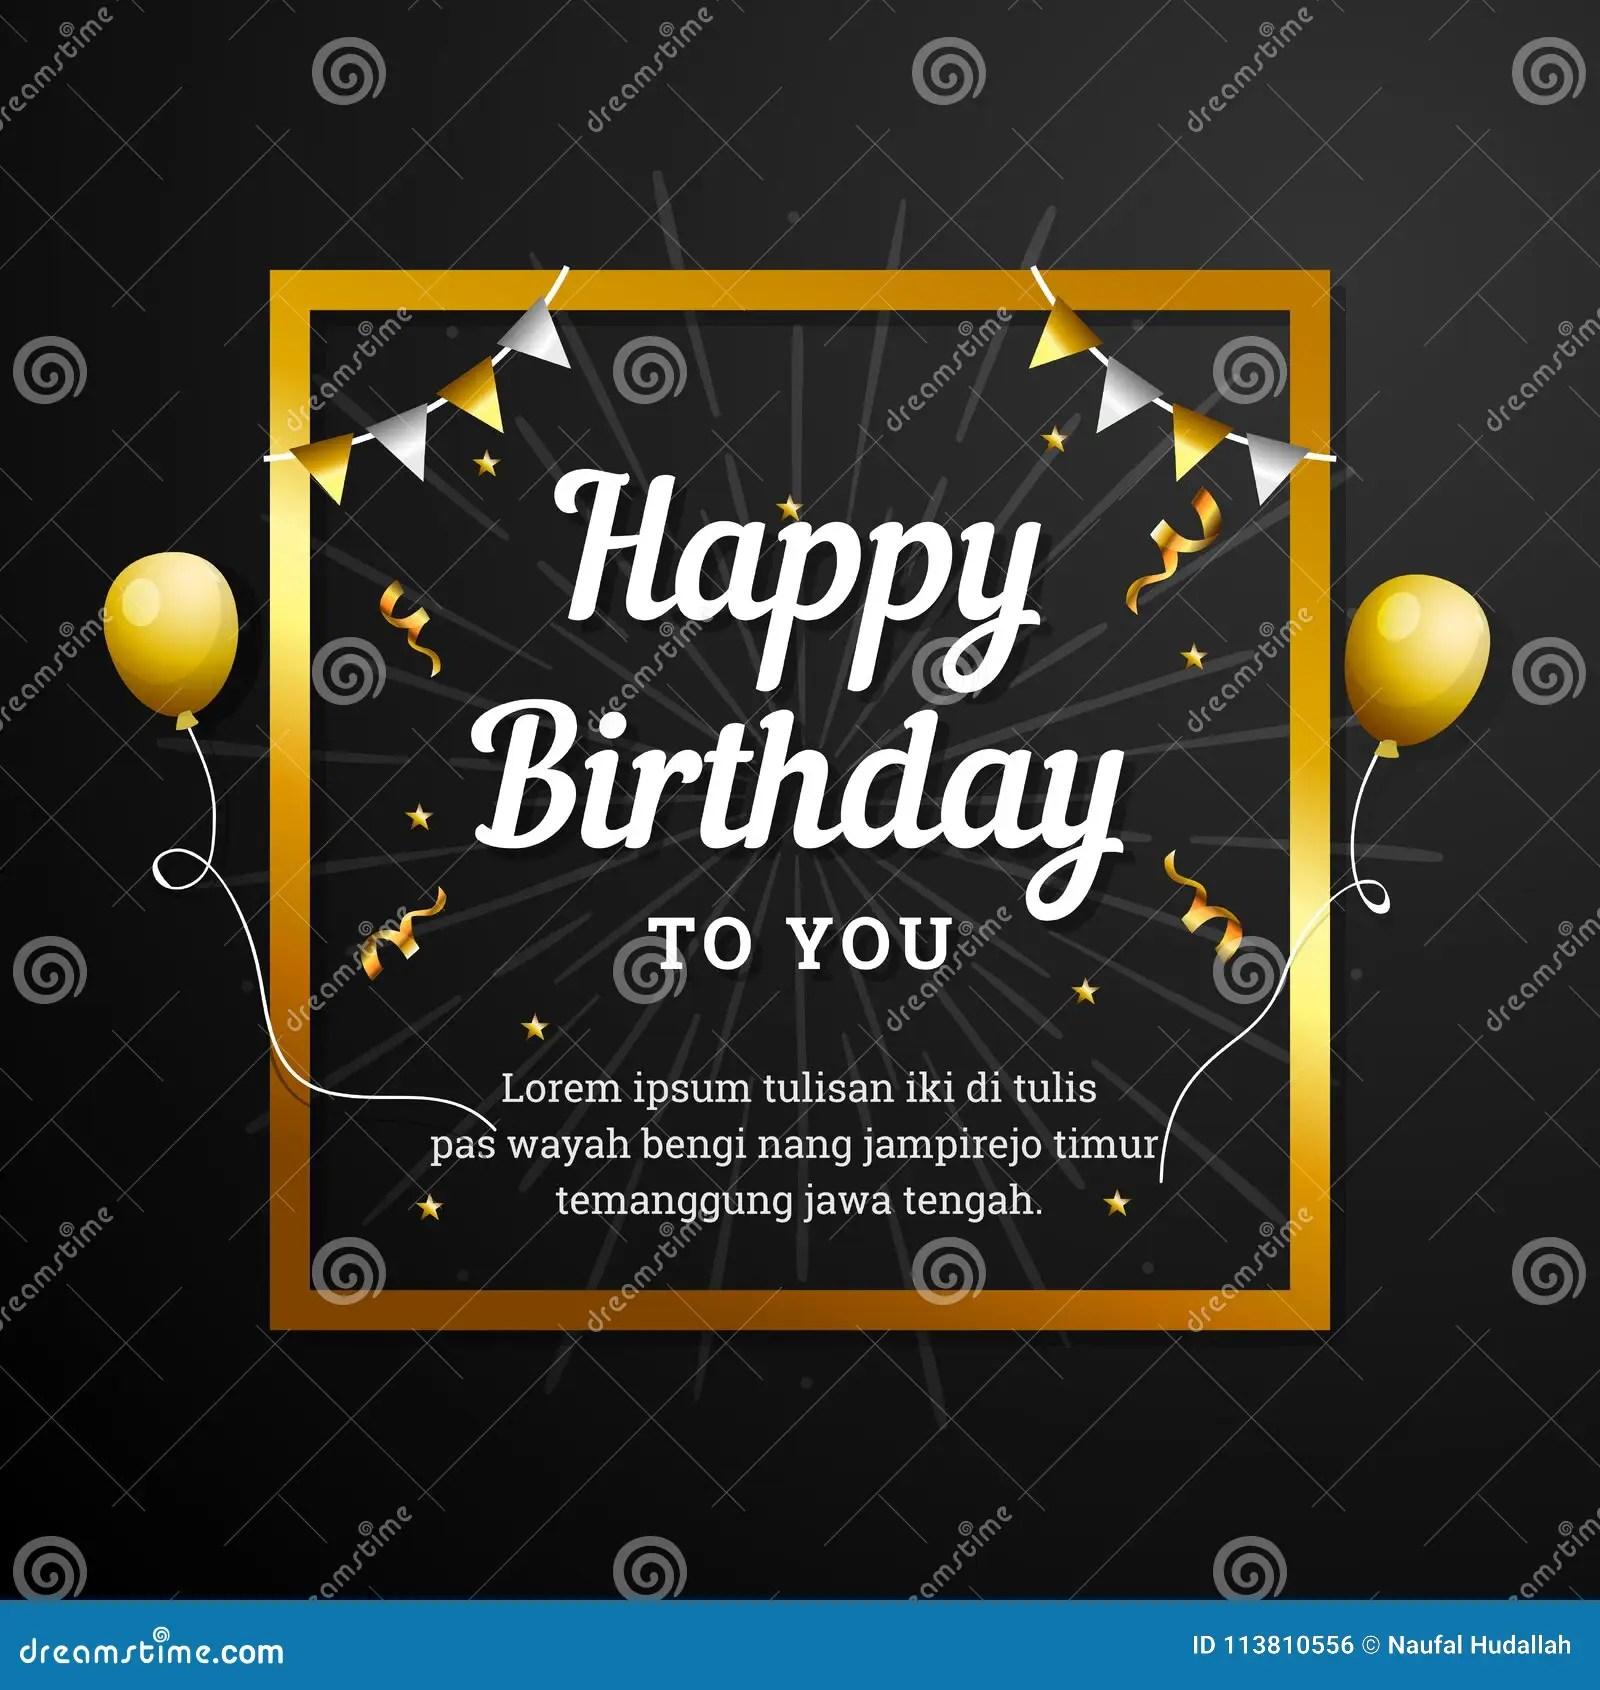 Professional Birthday Wishes